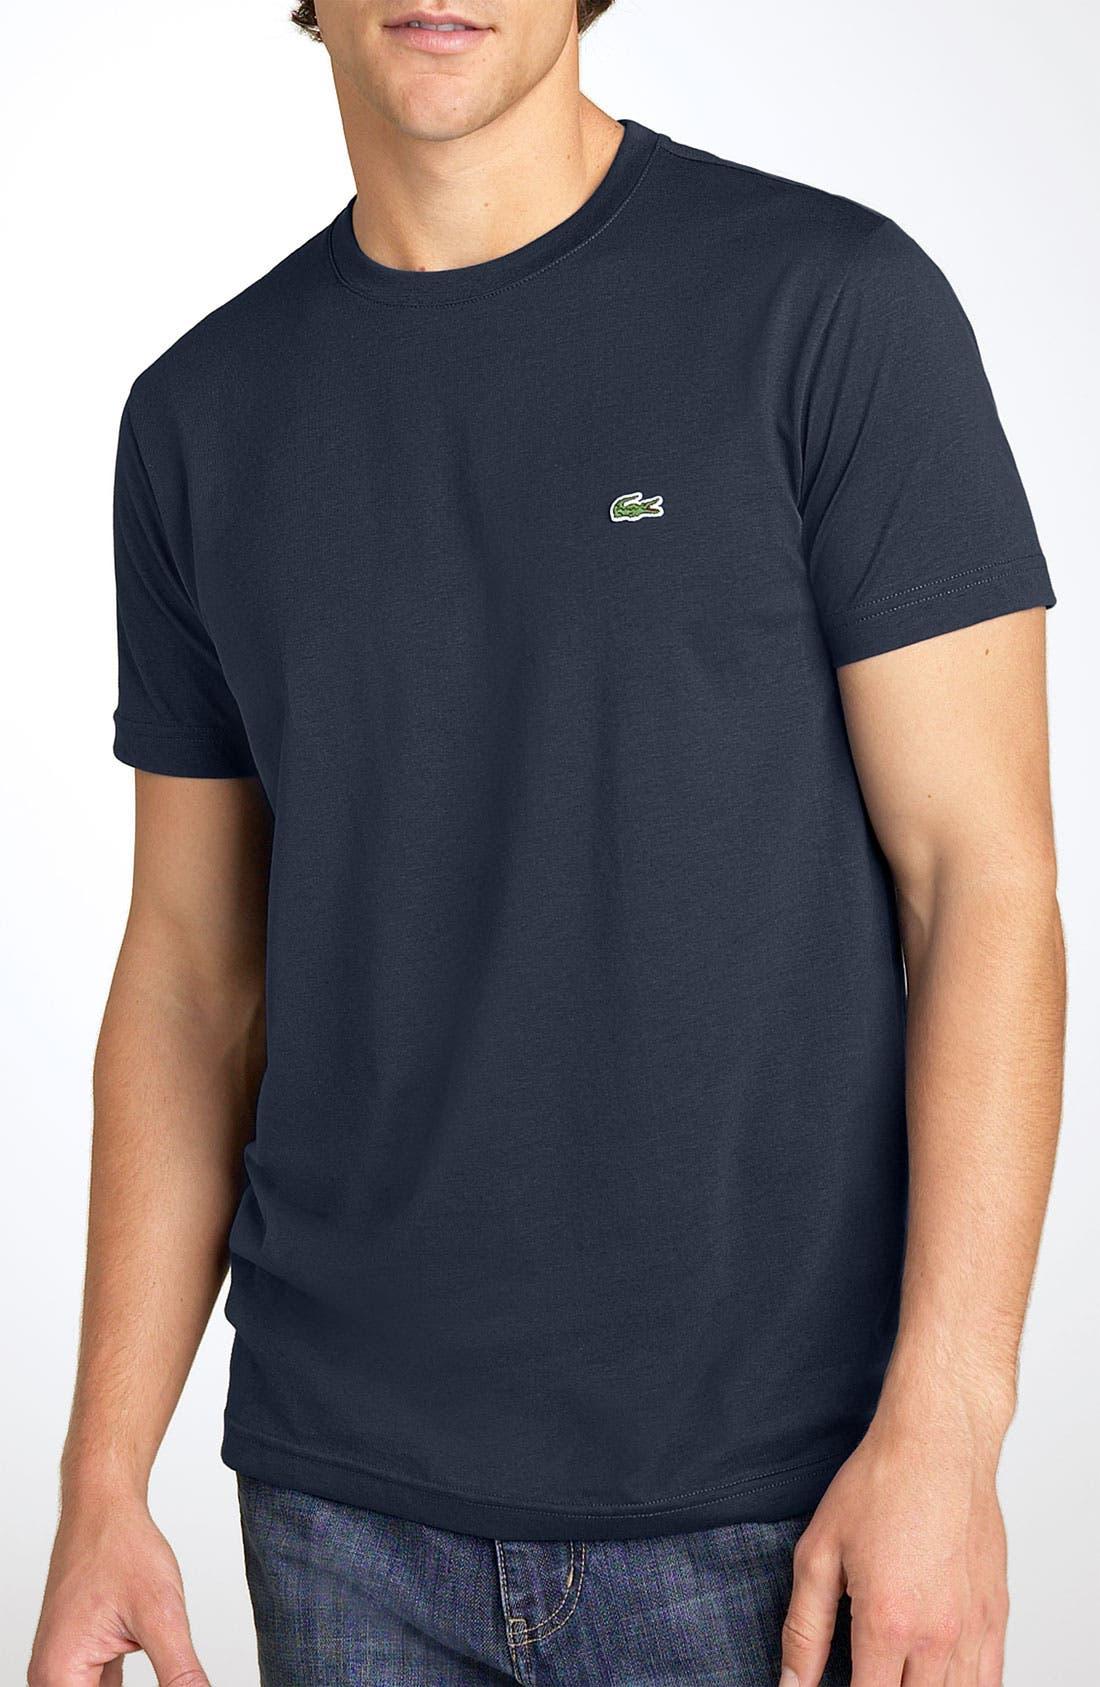 Alternate Image 1 Selected - Lacoste Pima Cotton T-Shirt (Big)